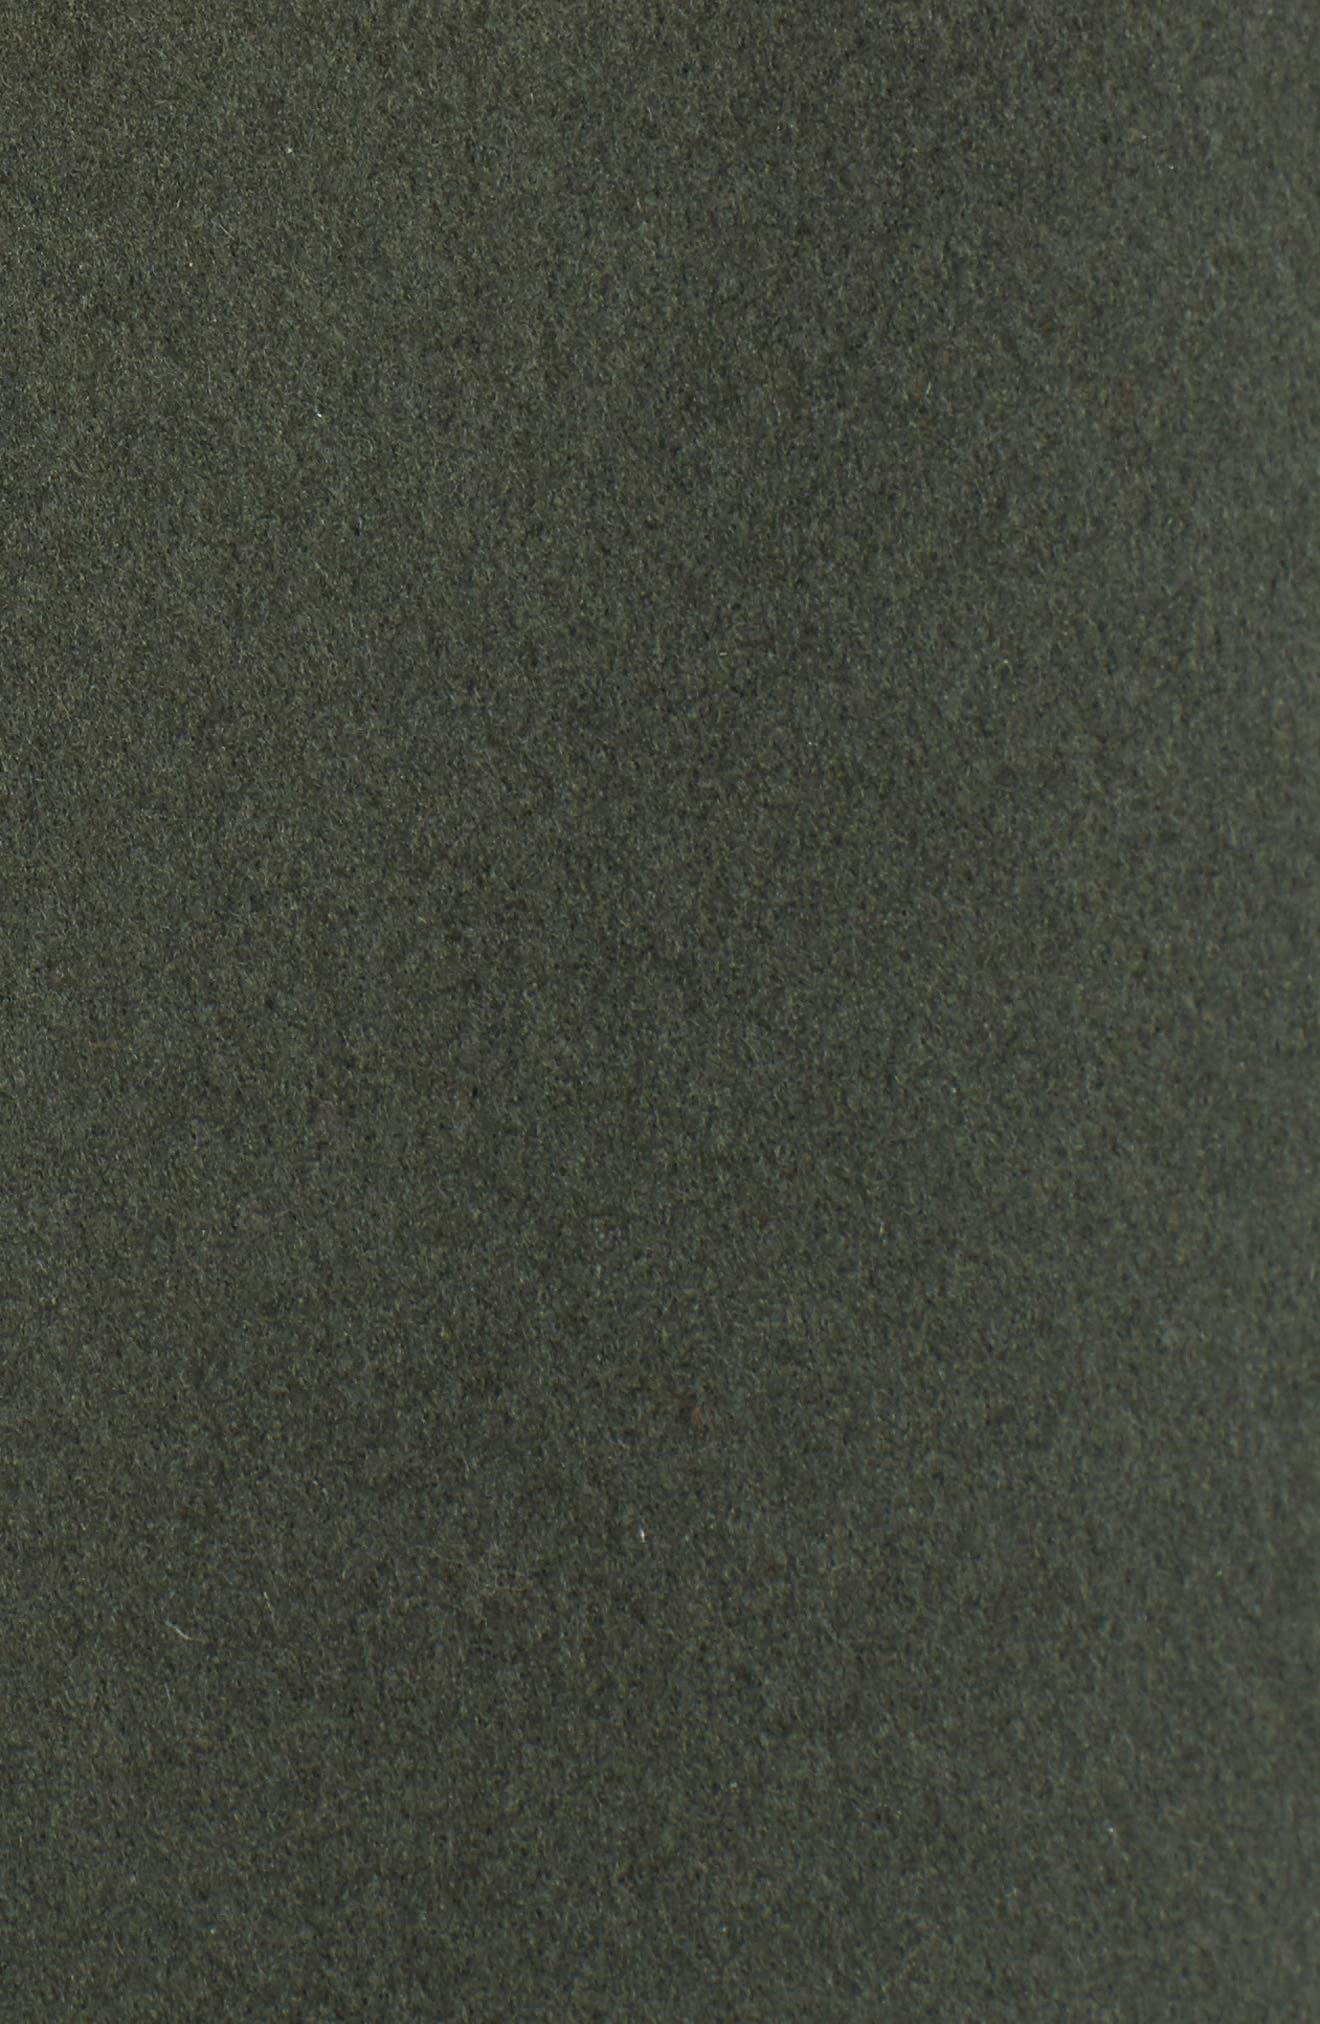 Alternate Image 3  - Fendi Wool Cape Coat with Genuine Fox Fur Pockets